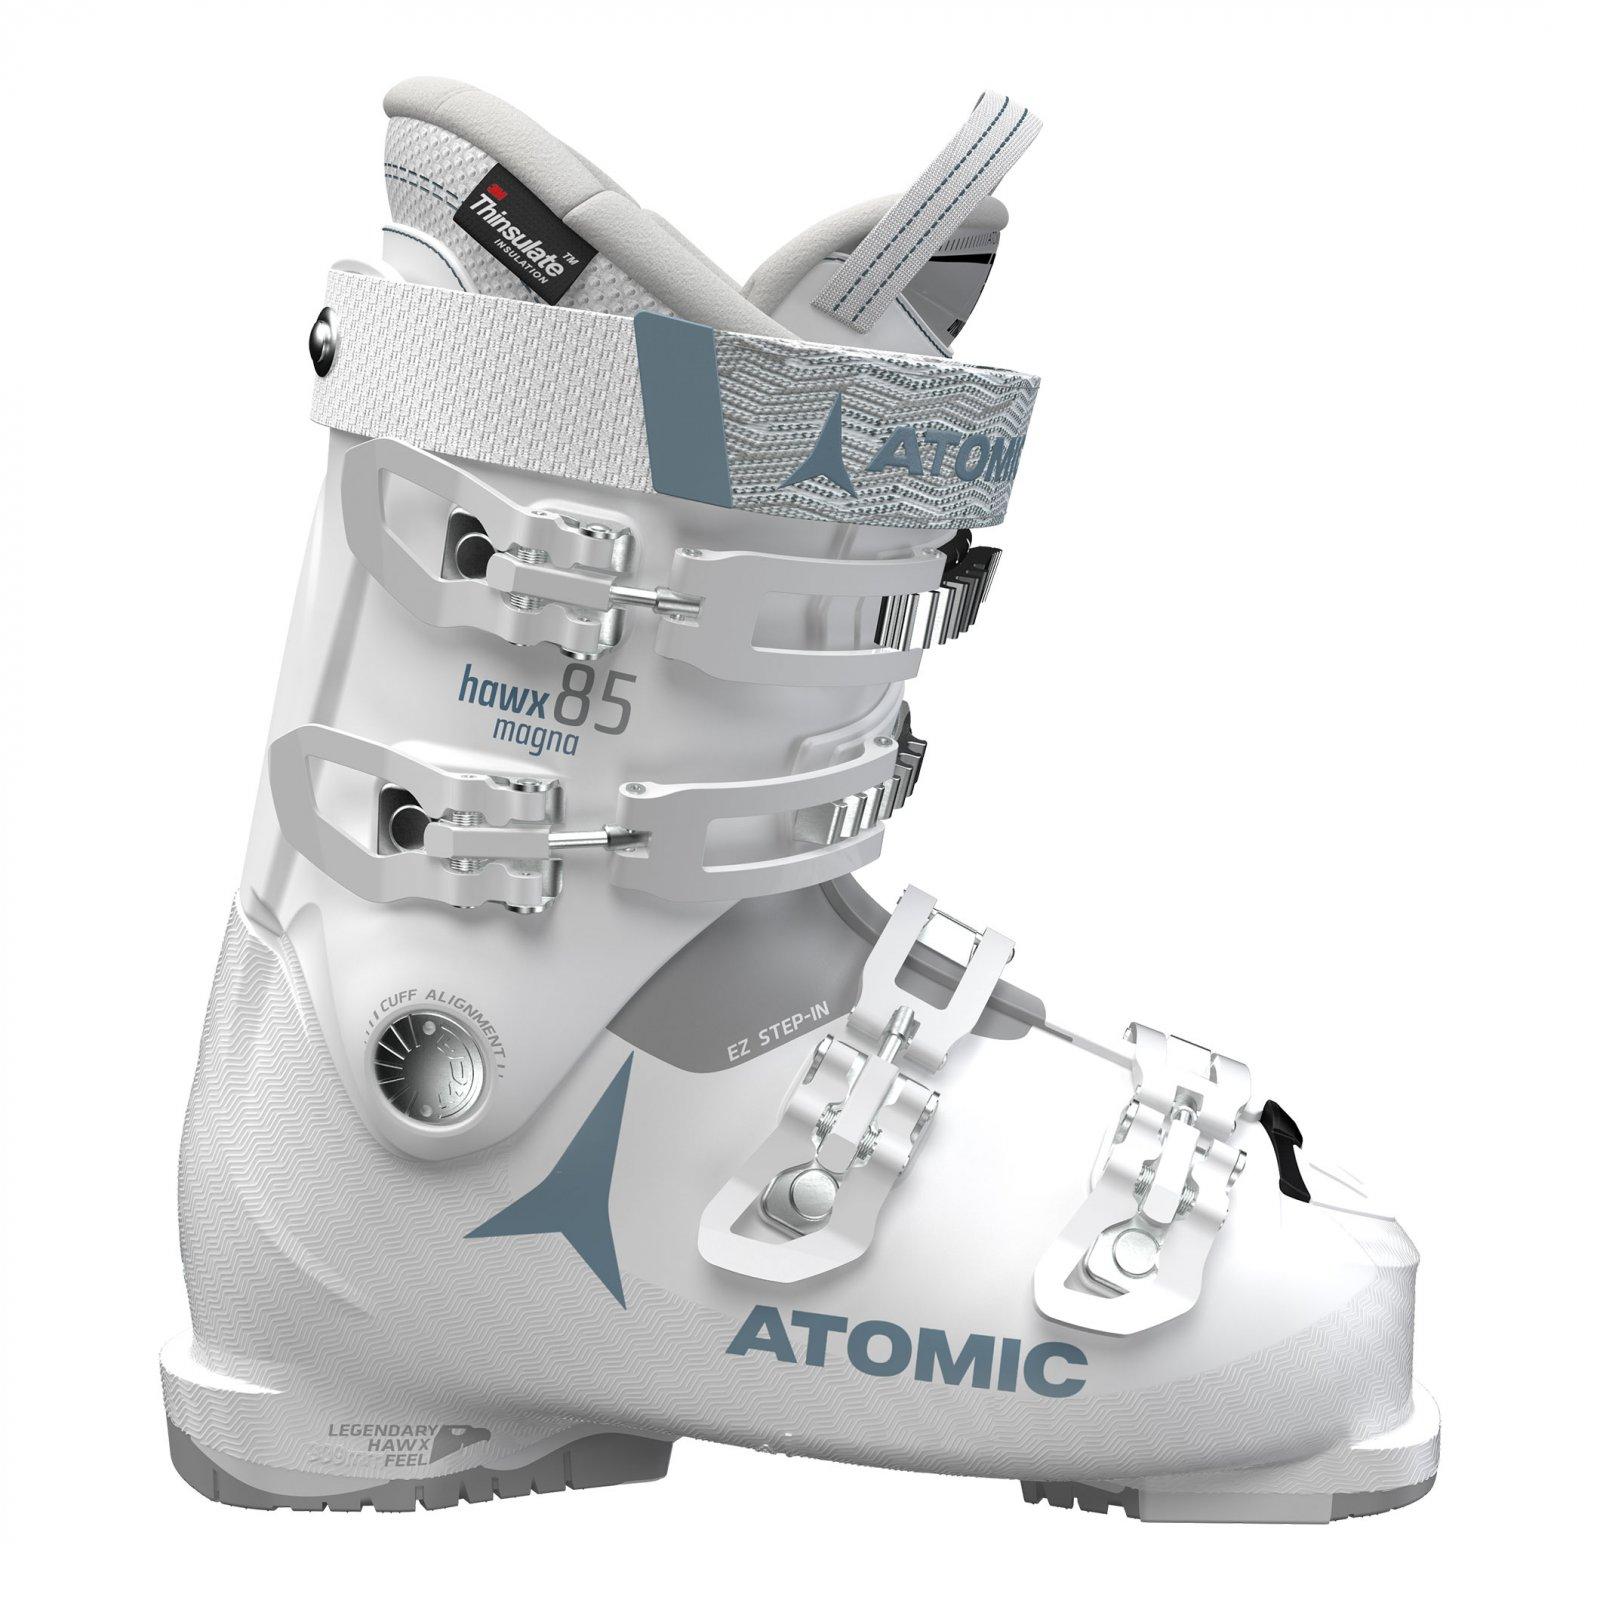 2020 Atomic Hawx Magna 85 Women's Ski Boots